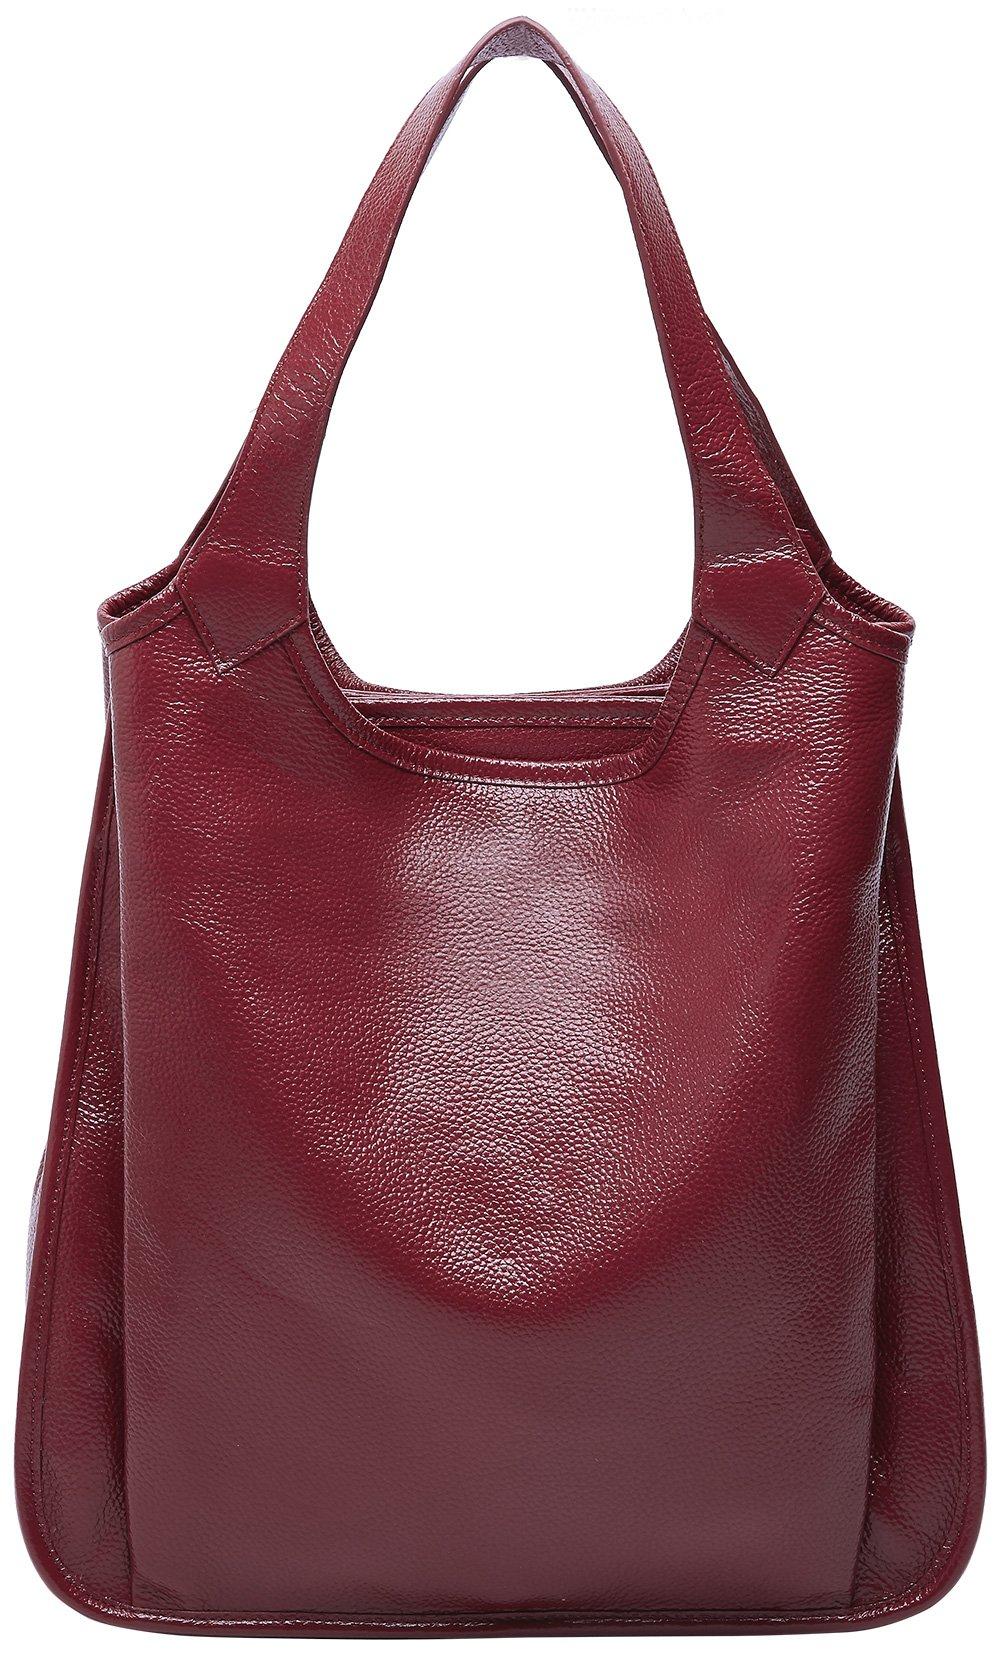 BOYATU Womens Tote Real Leather Handbag for Ladies Large Capacity Shoulder Purse (Wine Red)